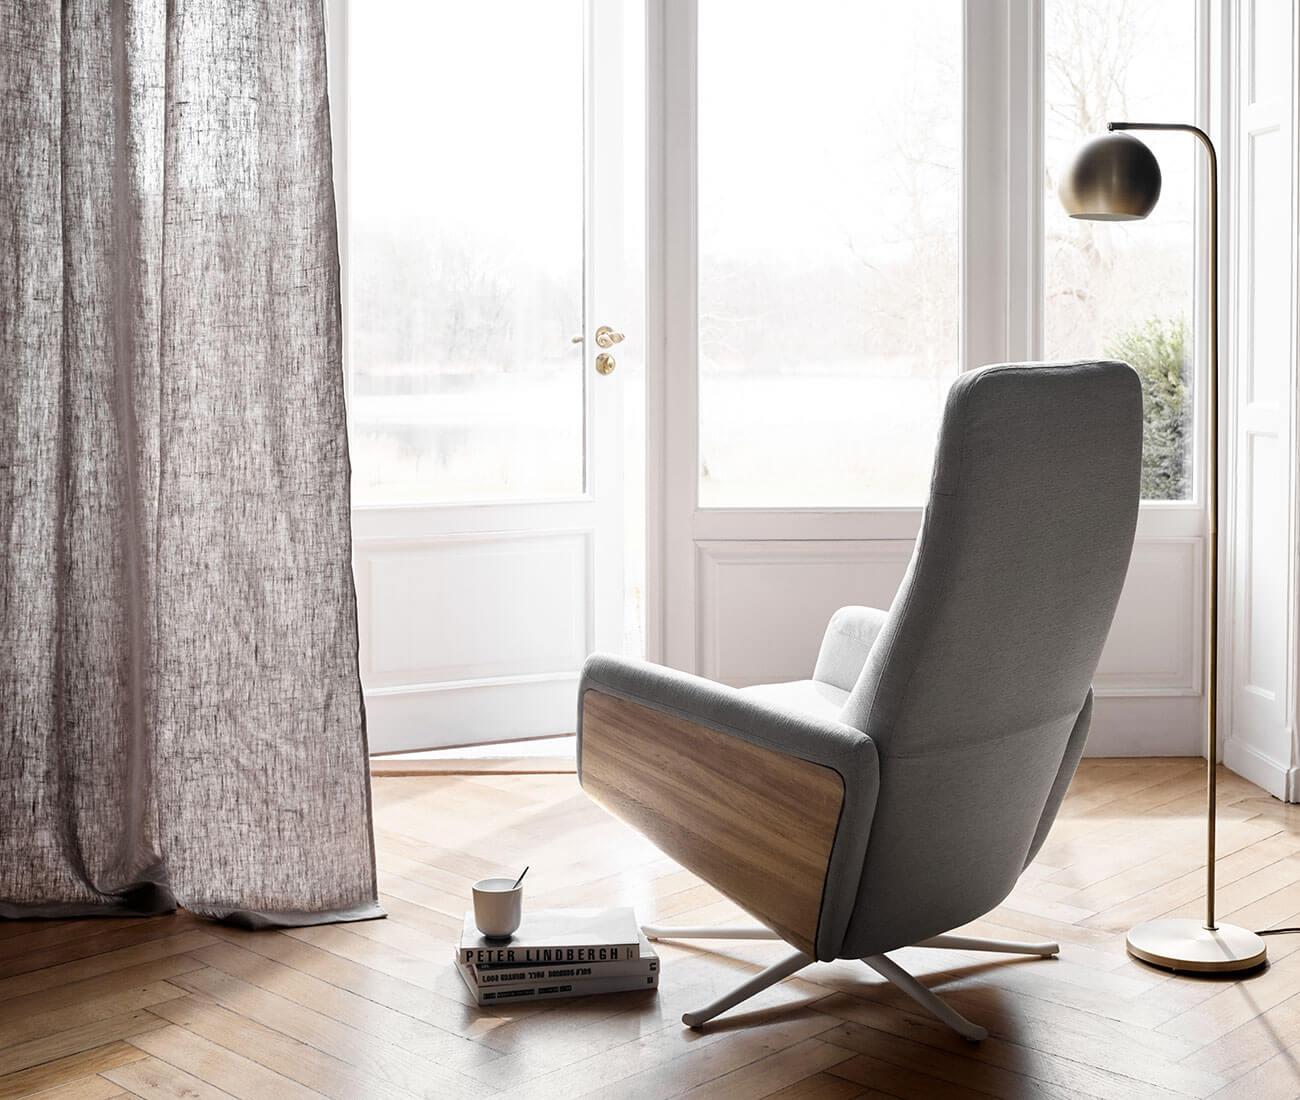 An Anders Nørgaard armchair